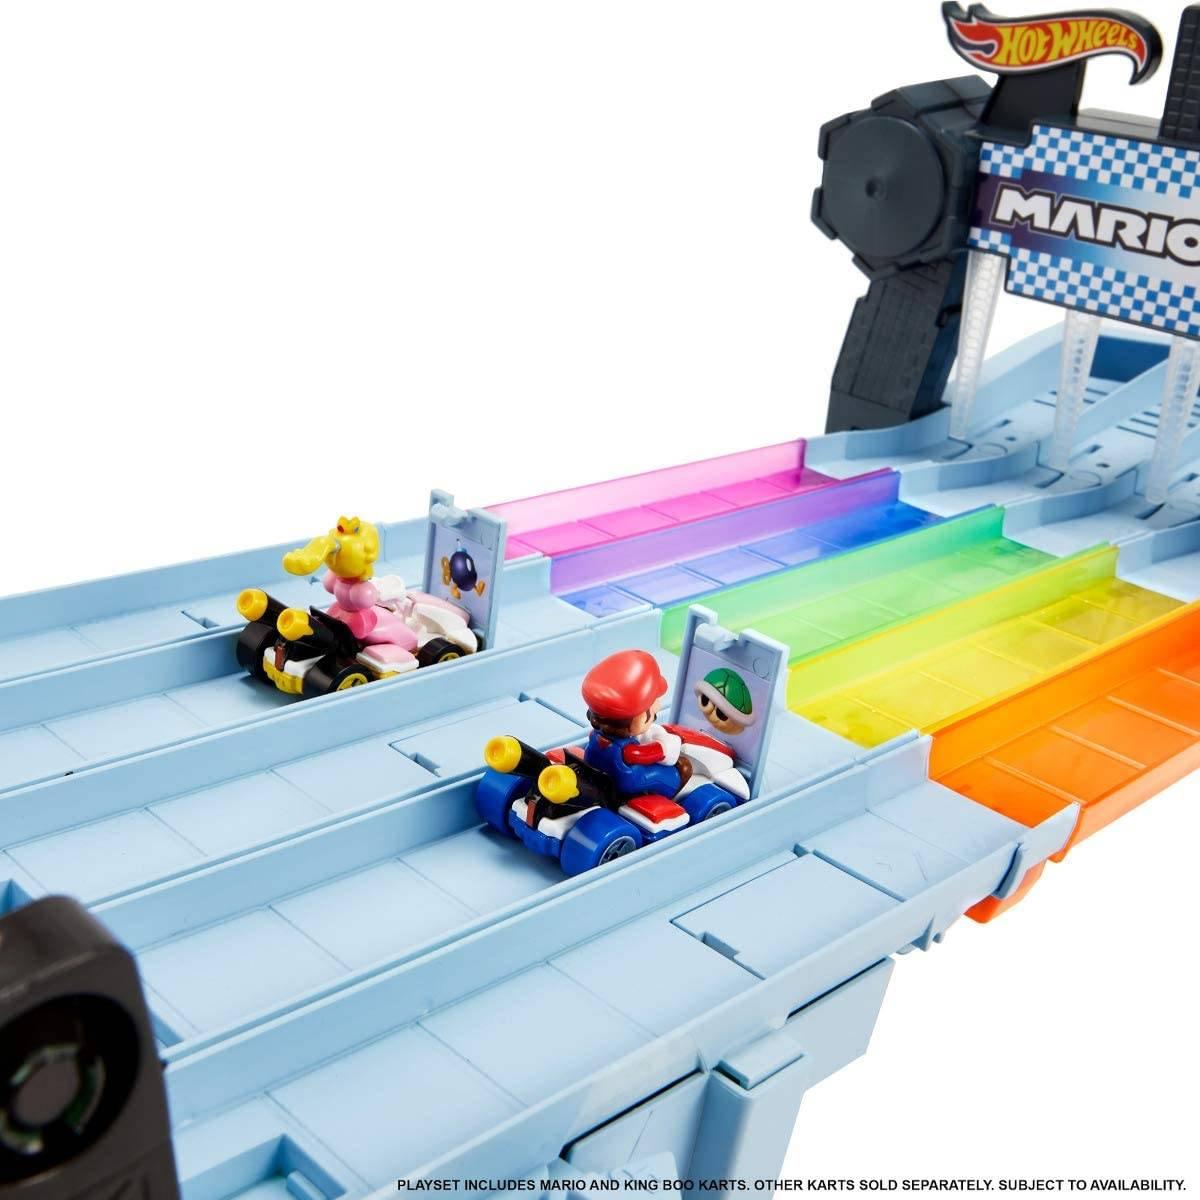 Mario Kart: Senda Arcoiris Hot Wheels